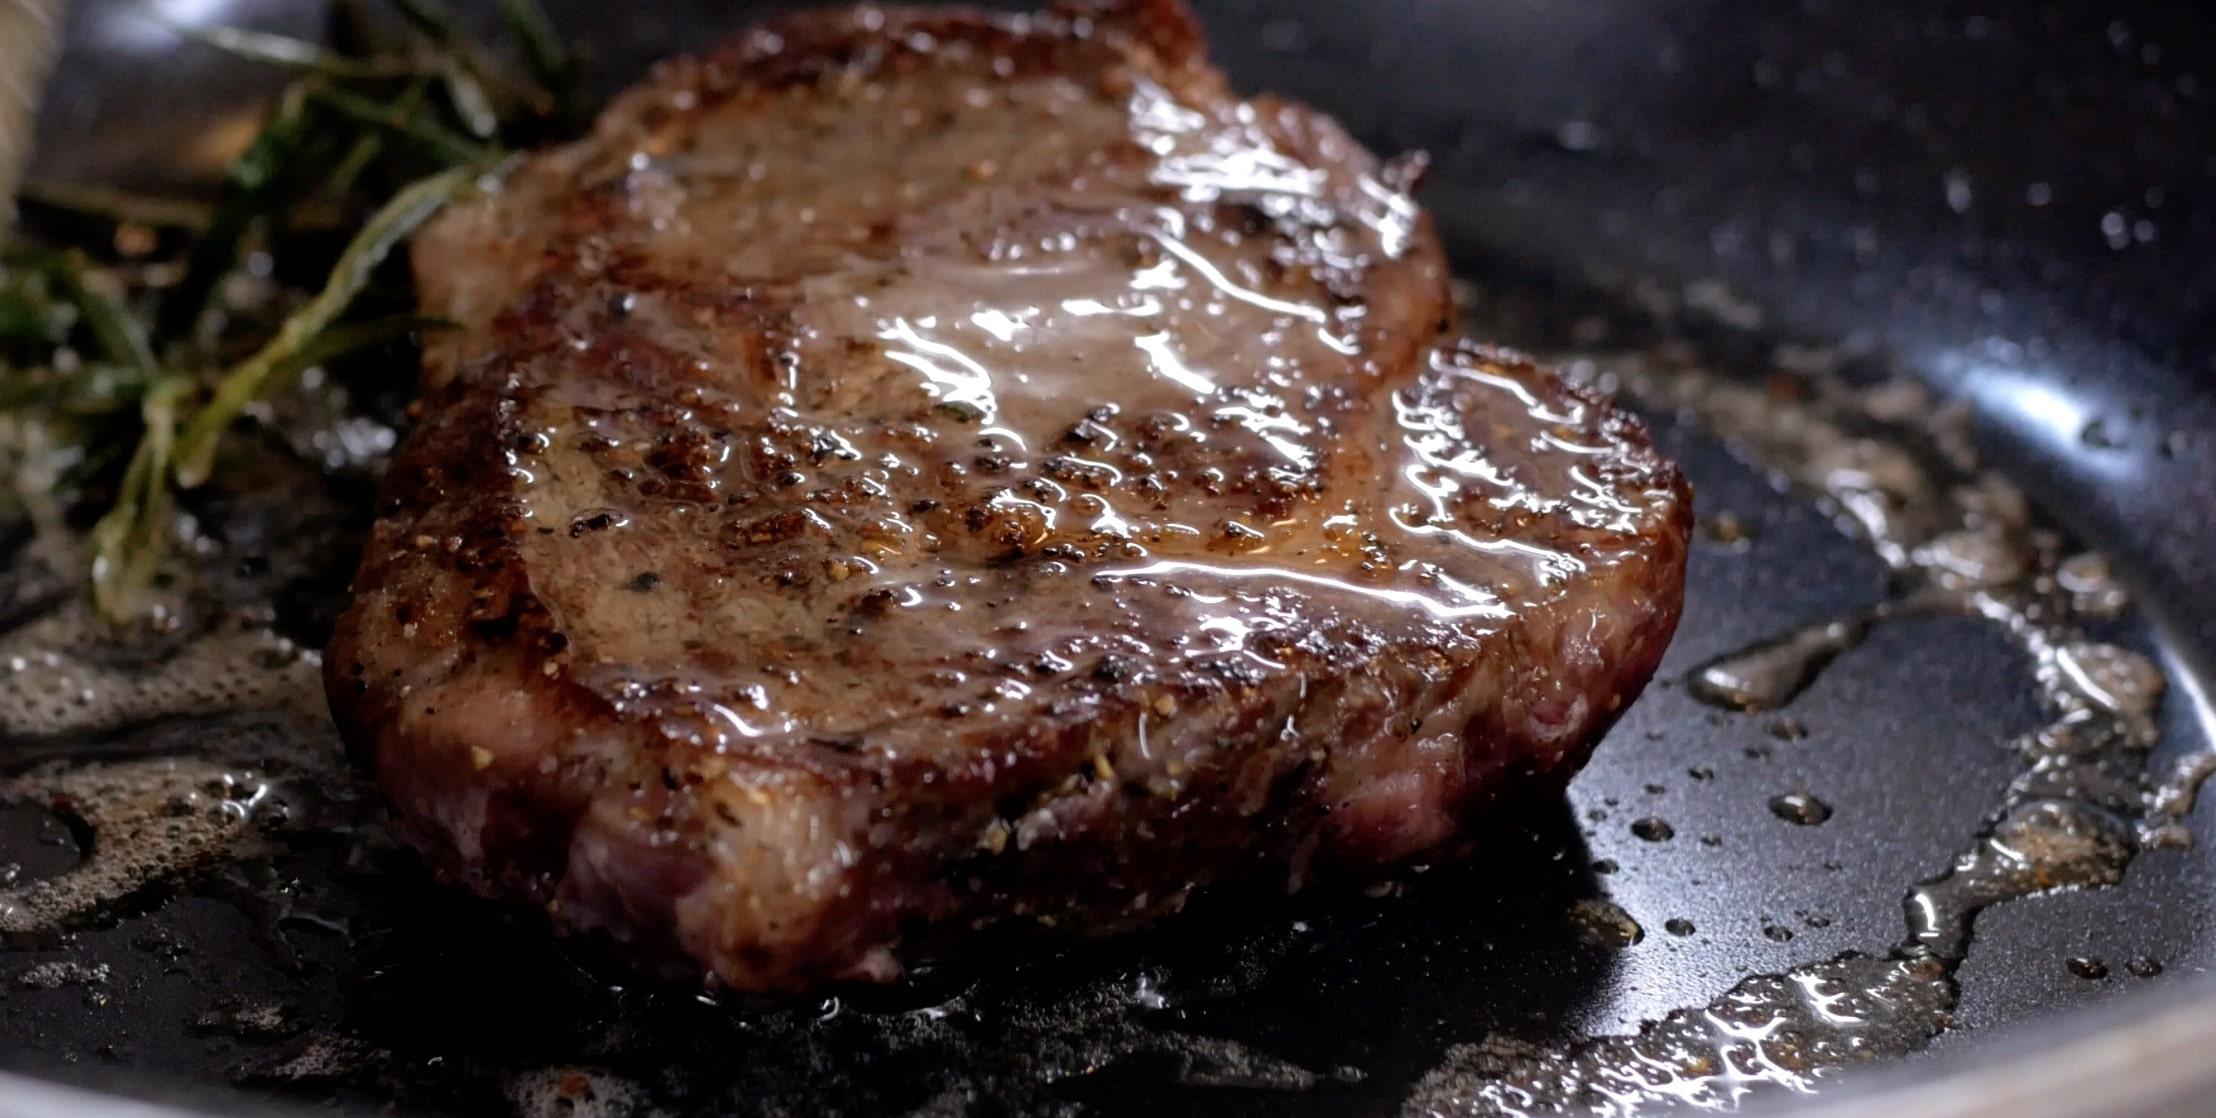 Добавим сливочное масло и им промажем стейк